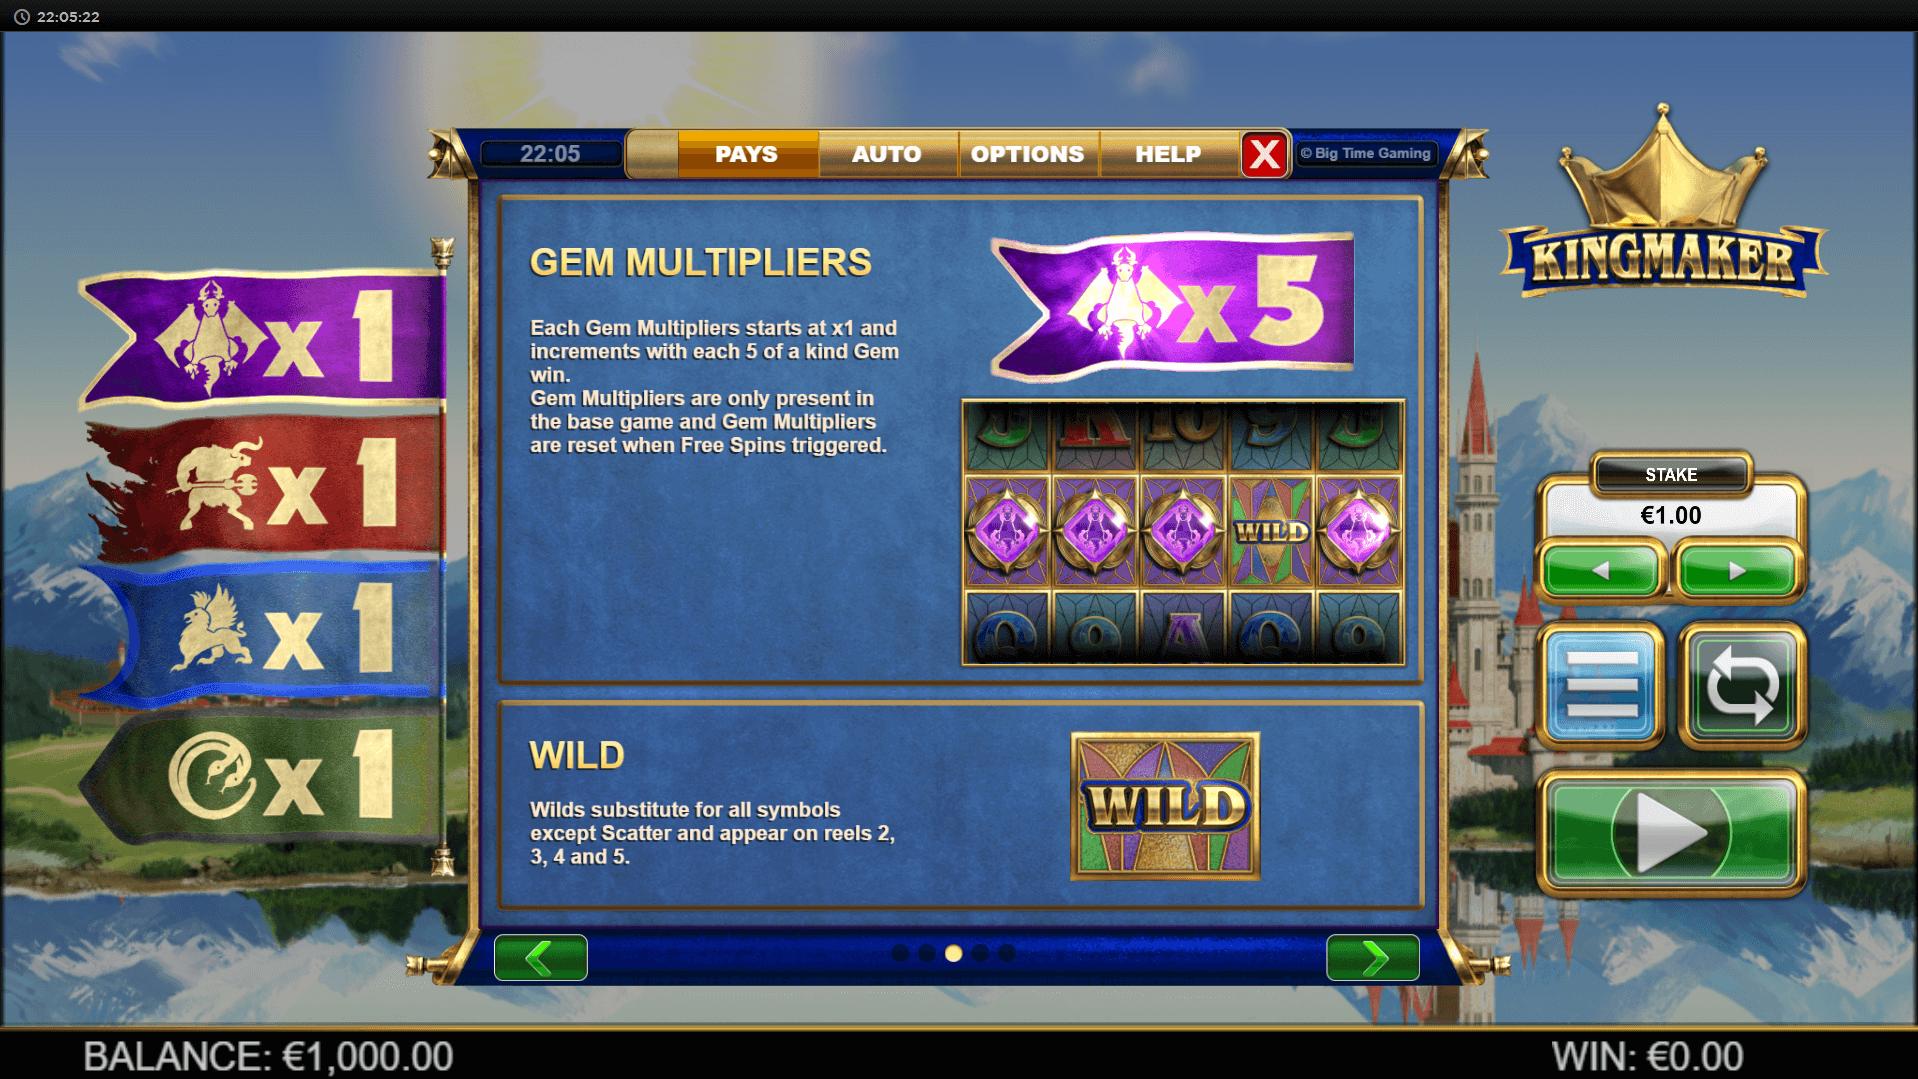 Kingmaker Slot Machine